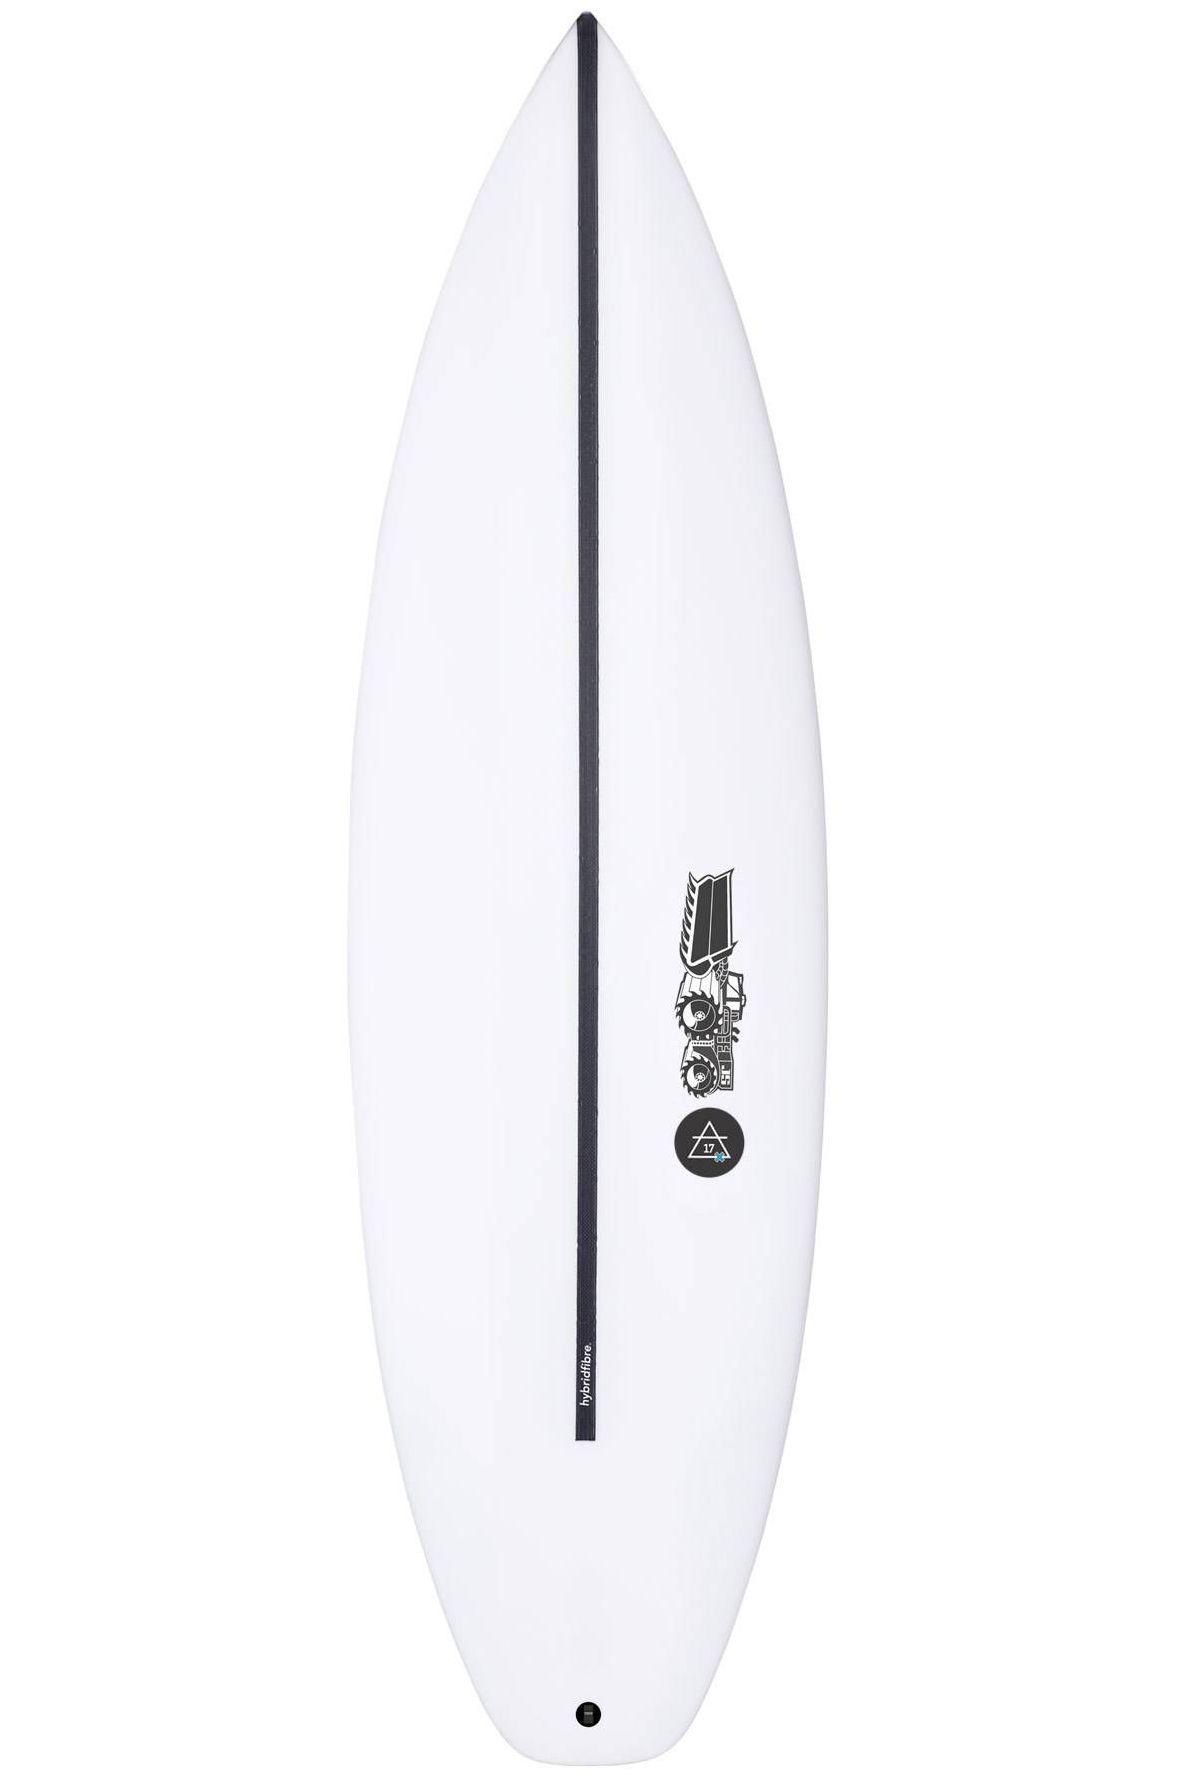 Prancha Surf JS 6'1 JULIAN AIR- 17X Squash Tail - White FCS II 6ft1